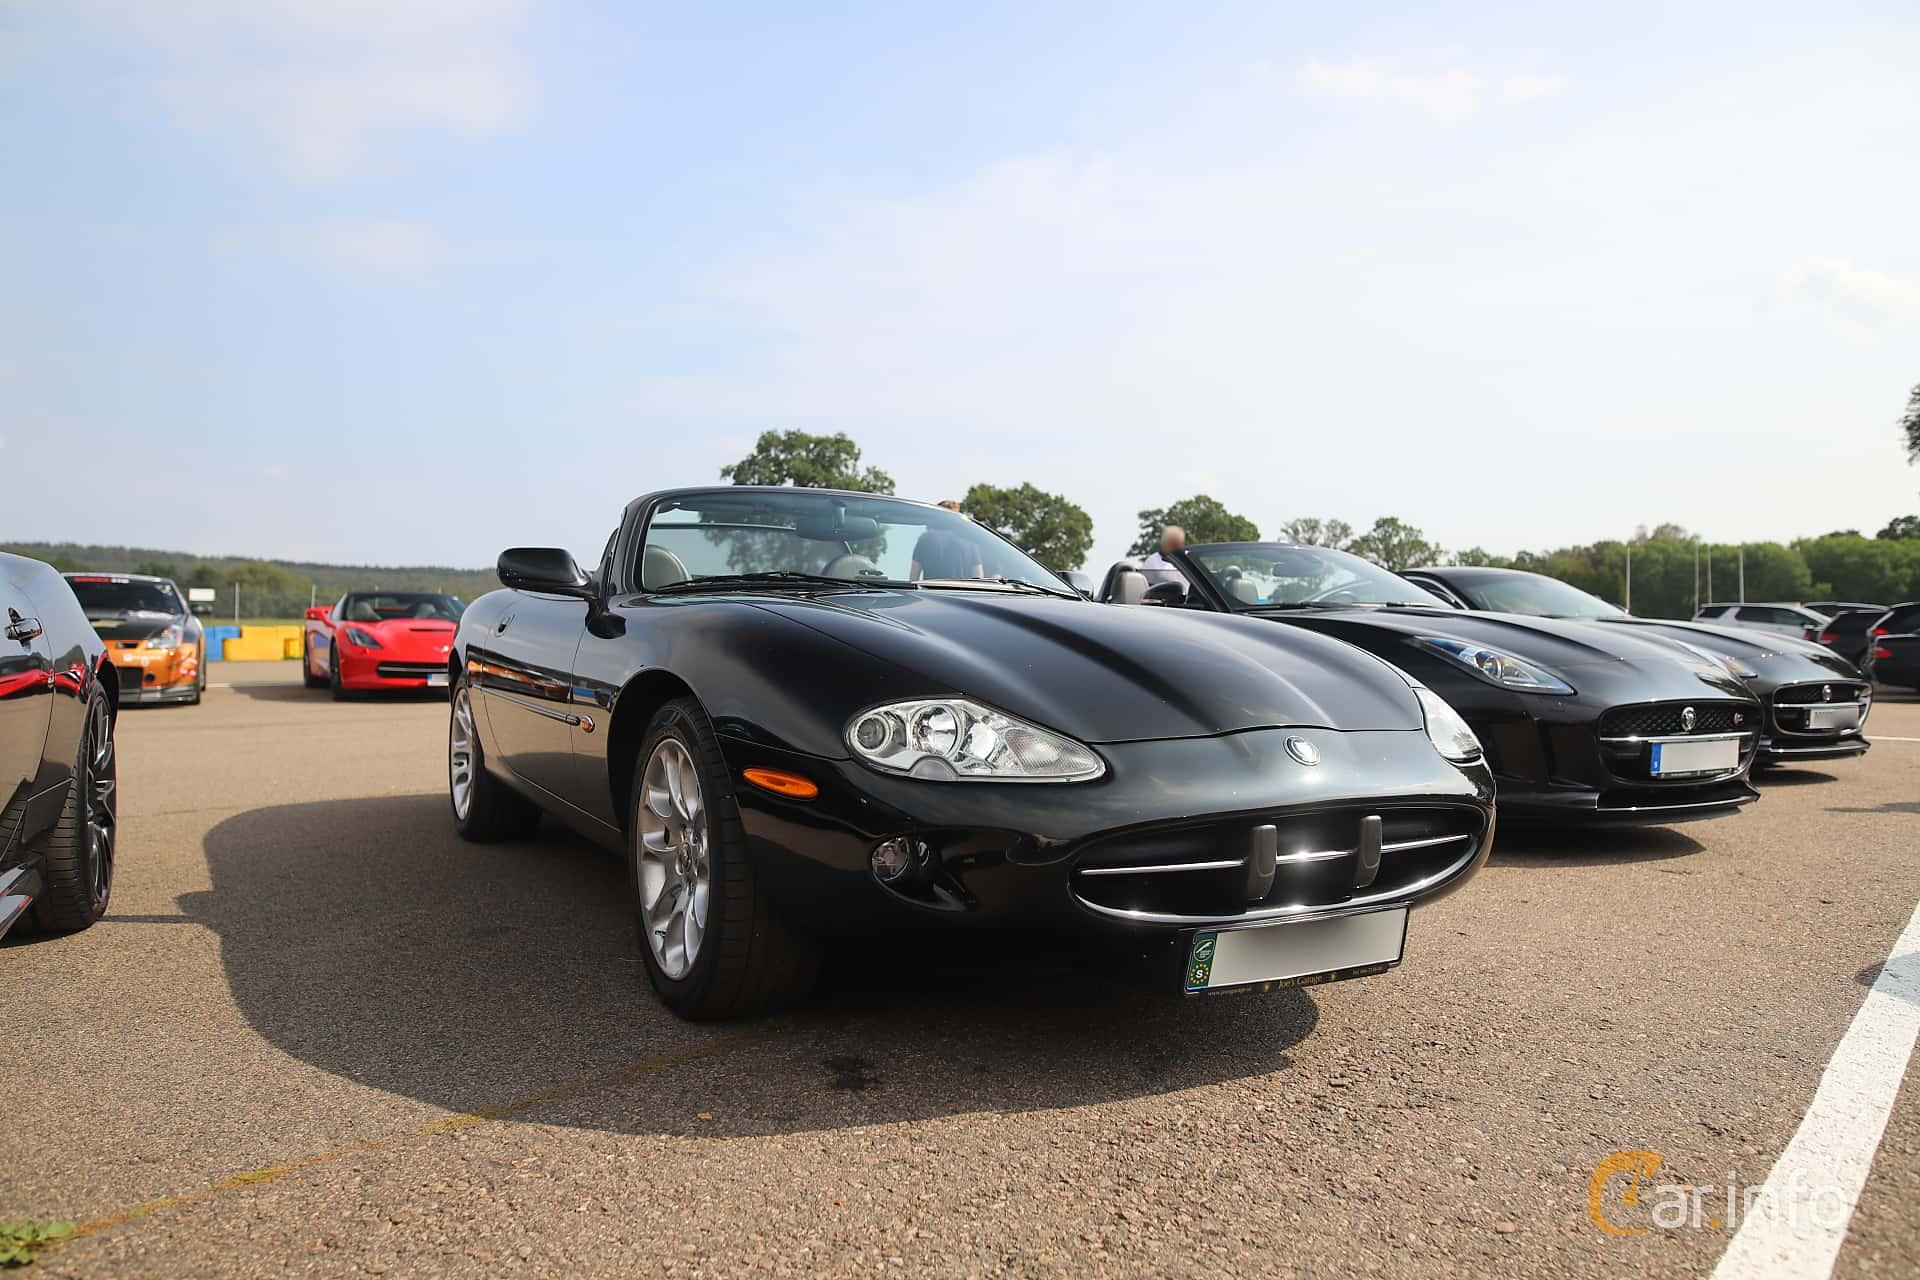 Jaguar XK8 Convertible 4.0 V8 Automatic, 284hp, 1999 at Autoropa Racing day Knutstorp 2019